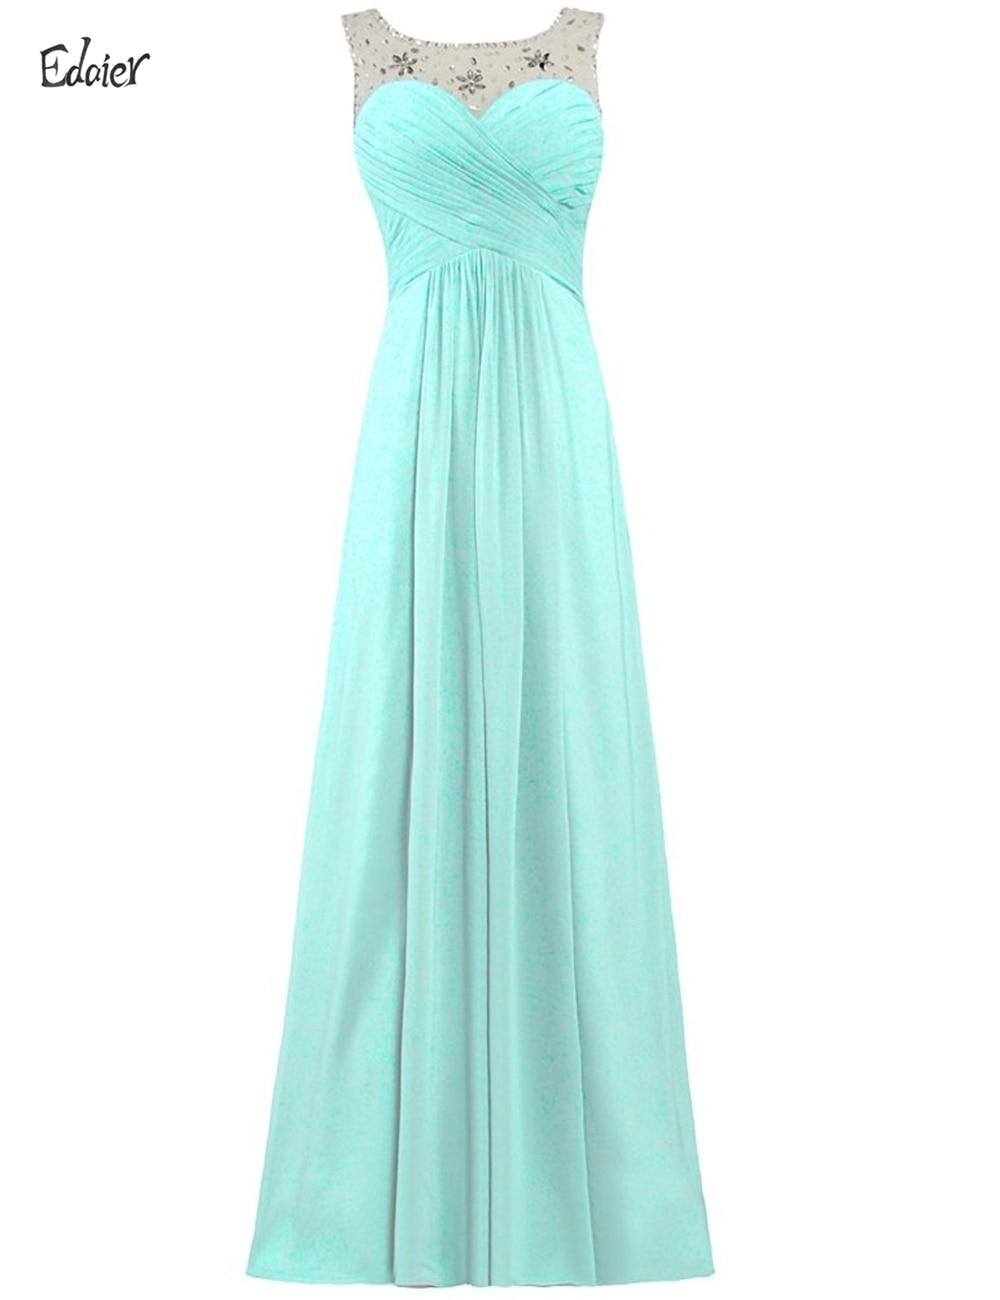 Long chiffon crystals bridesmaid dress edaier 2017 for Burgundy wedding dresses plus size